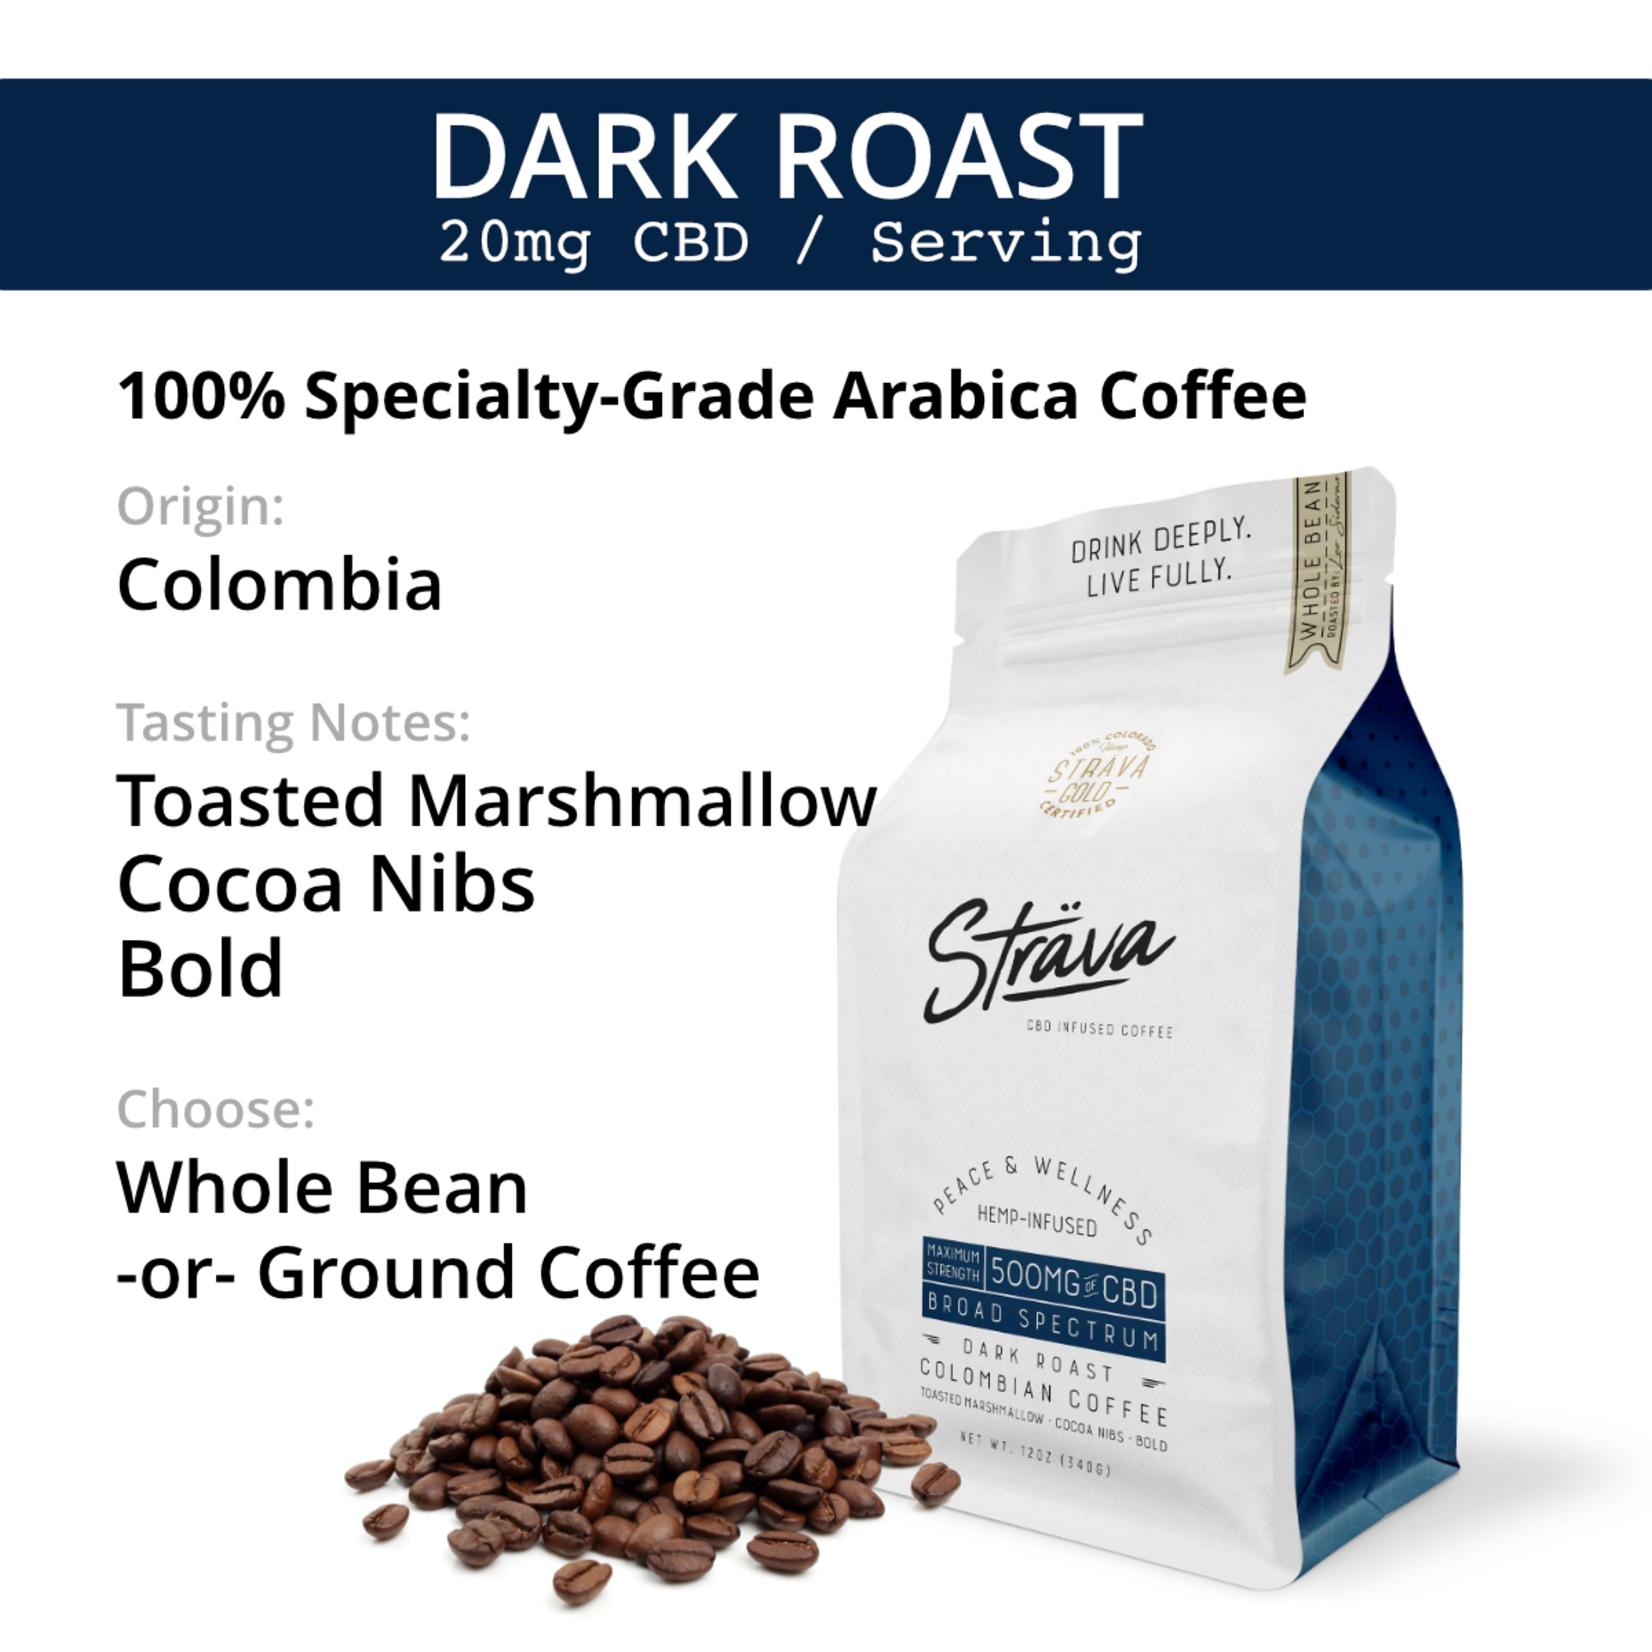 Strava Strava CBD Infused Coffee 500mg Maximum Strength Broad Spectrum Dark Roast Columbian Coffee